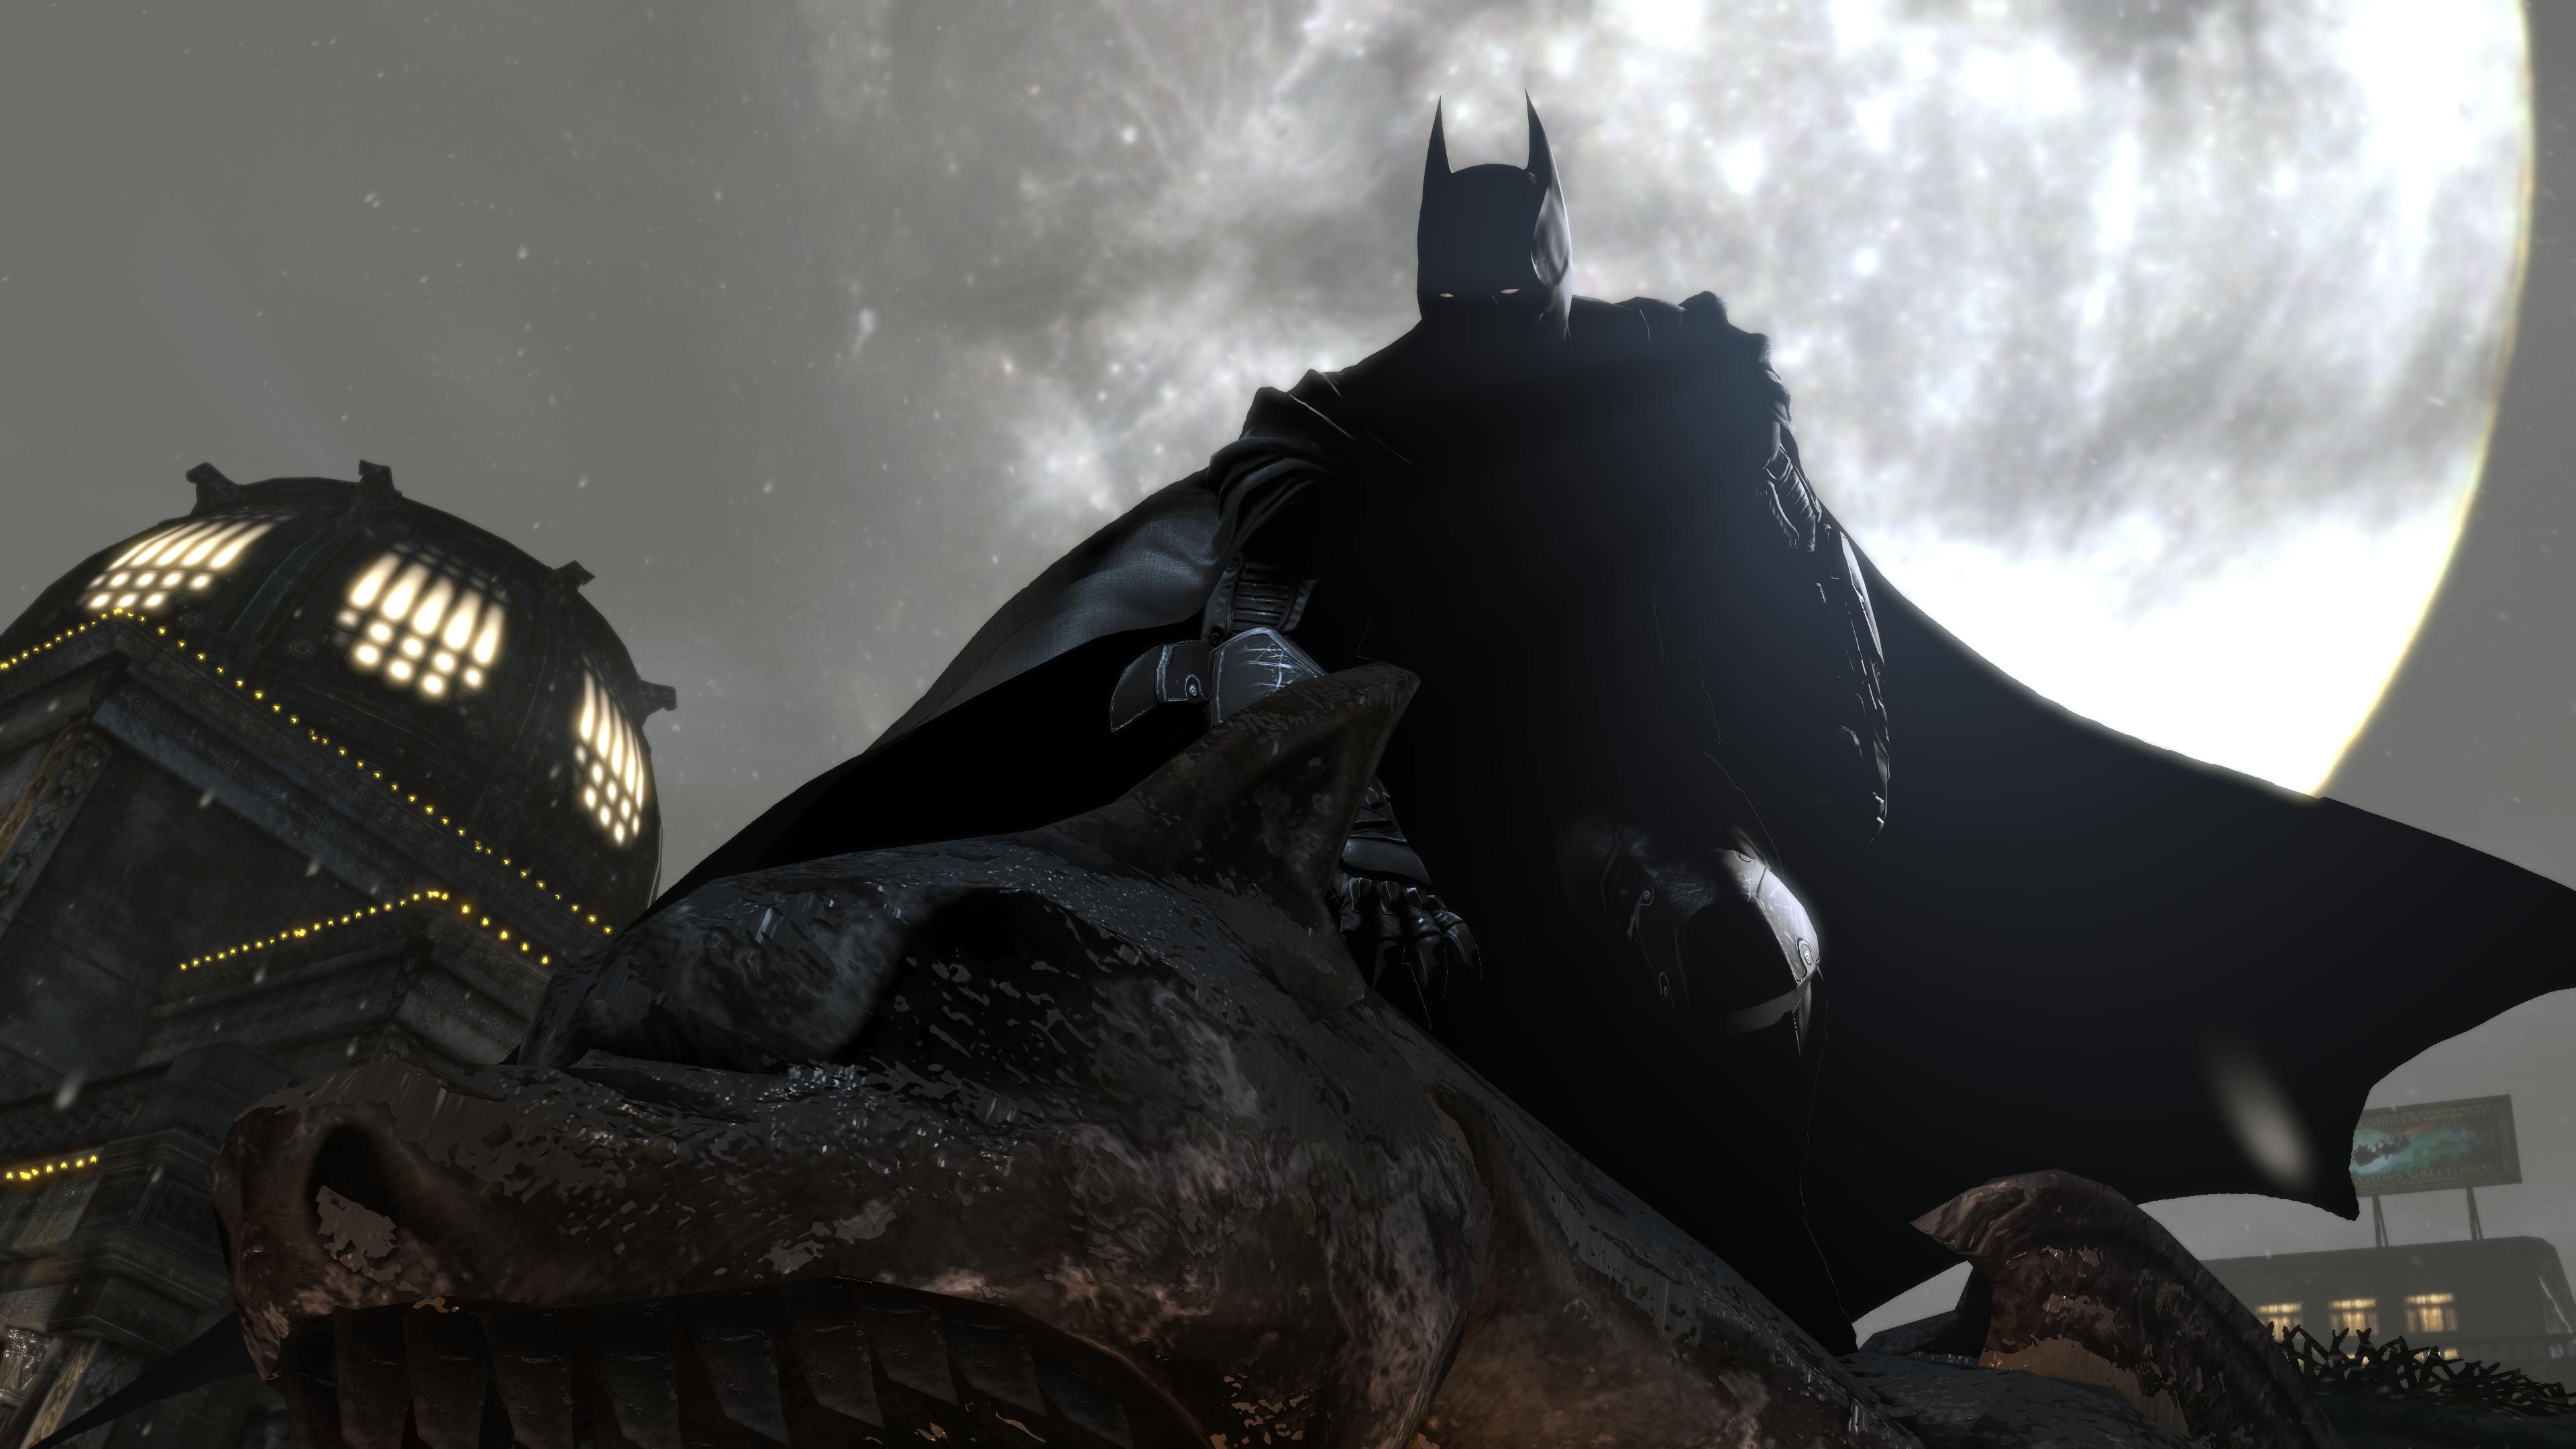 Batman Arkham Origins 4K PC Screenshot 3840x2160